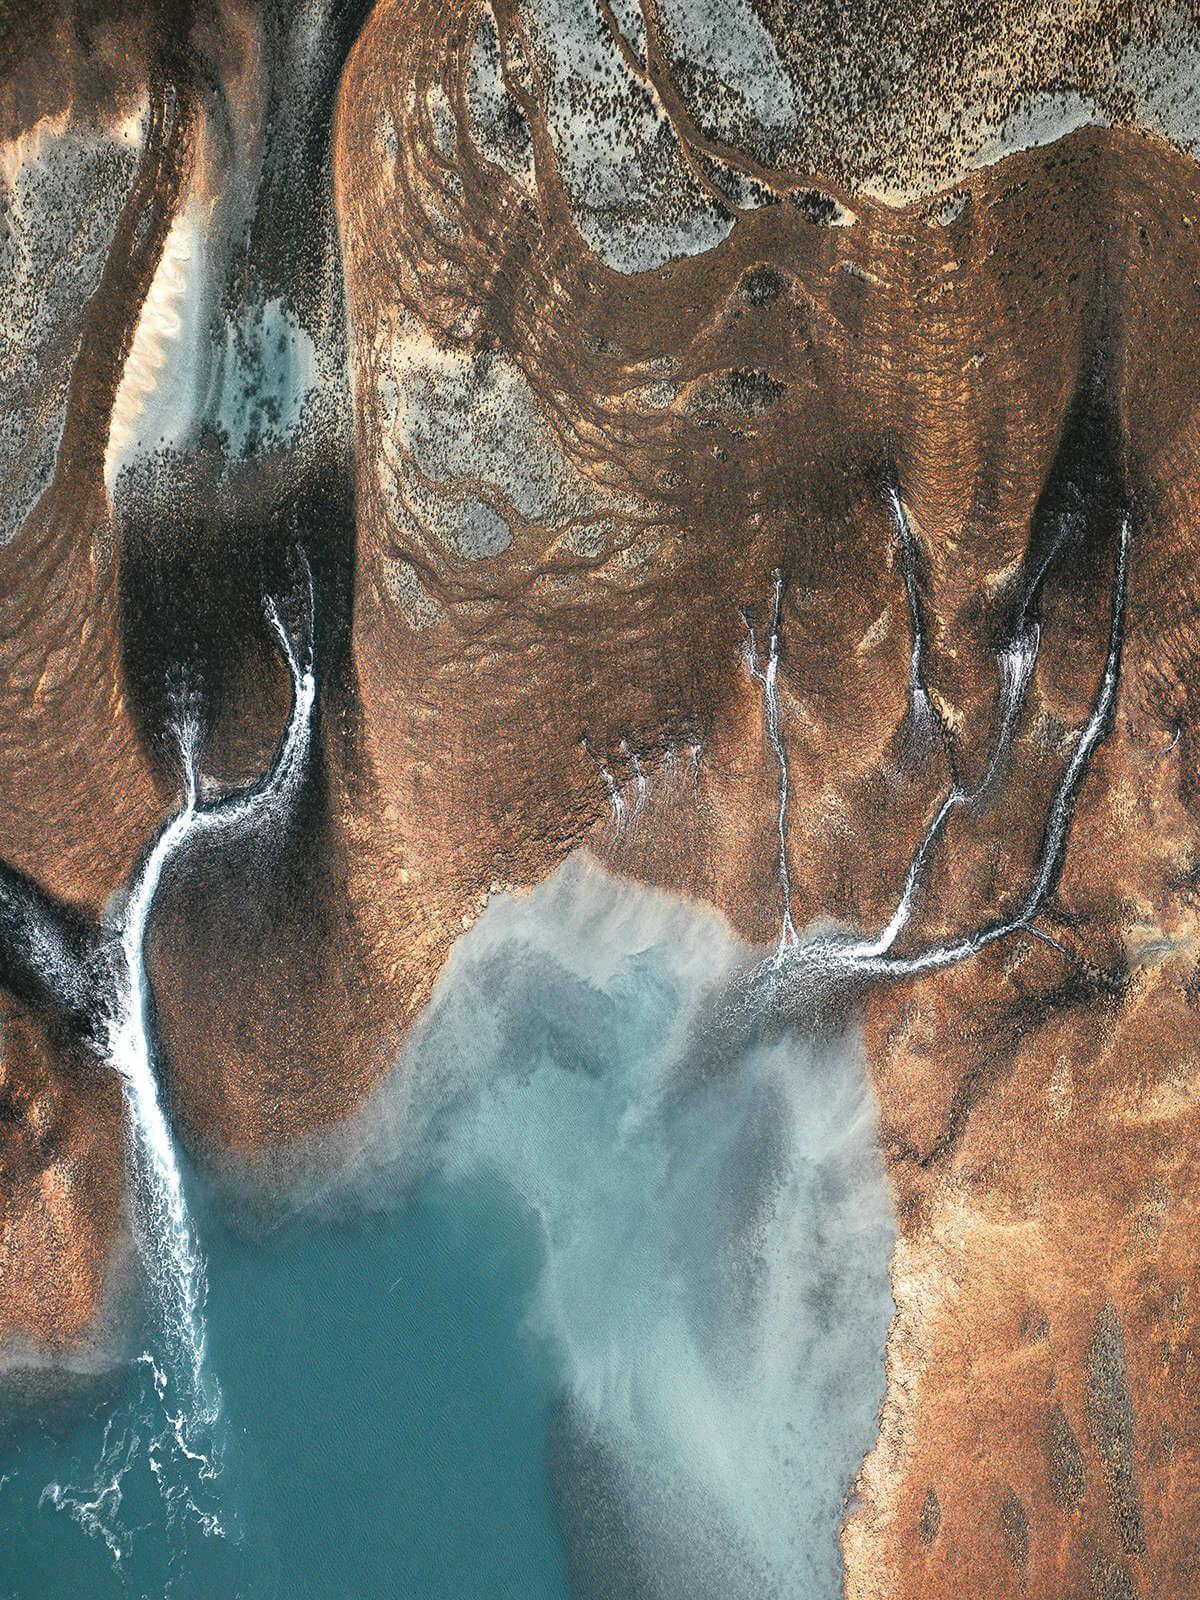 fotografia aérea Kevin Krautgarner